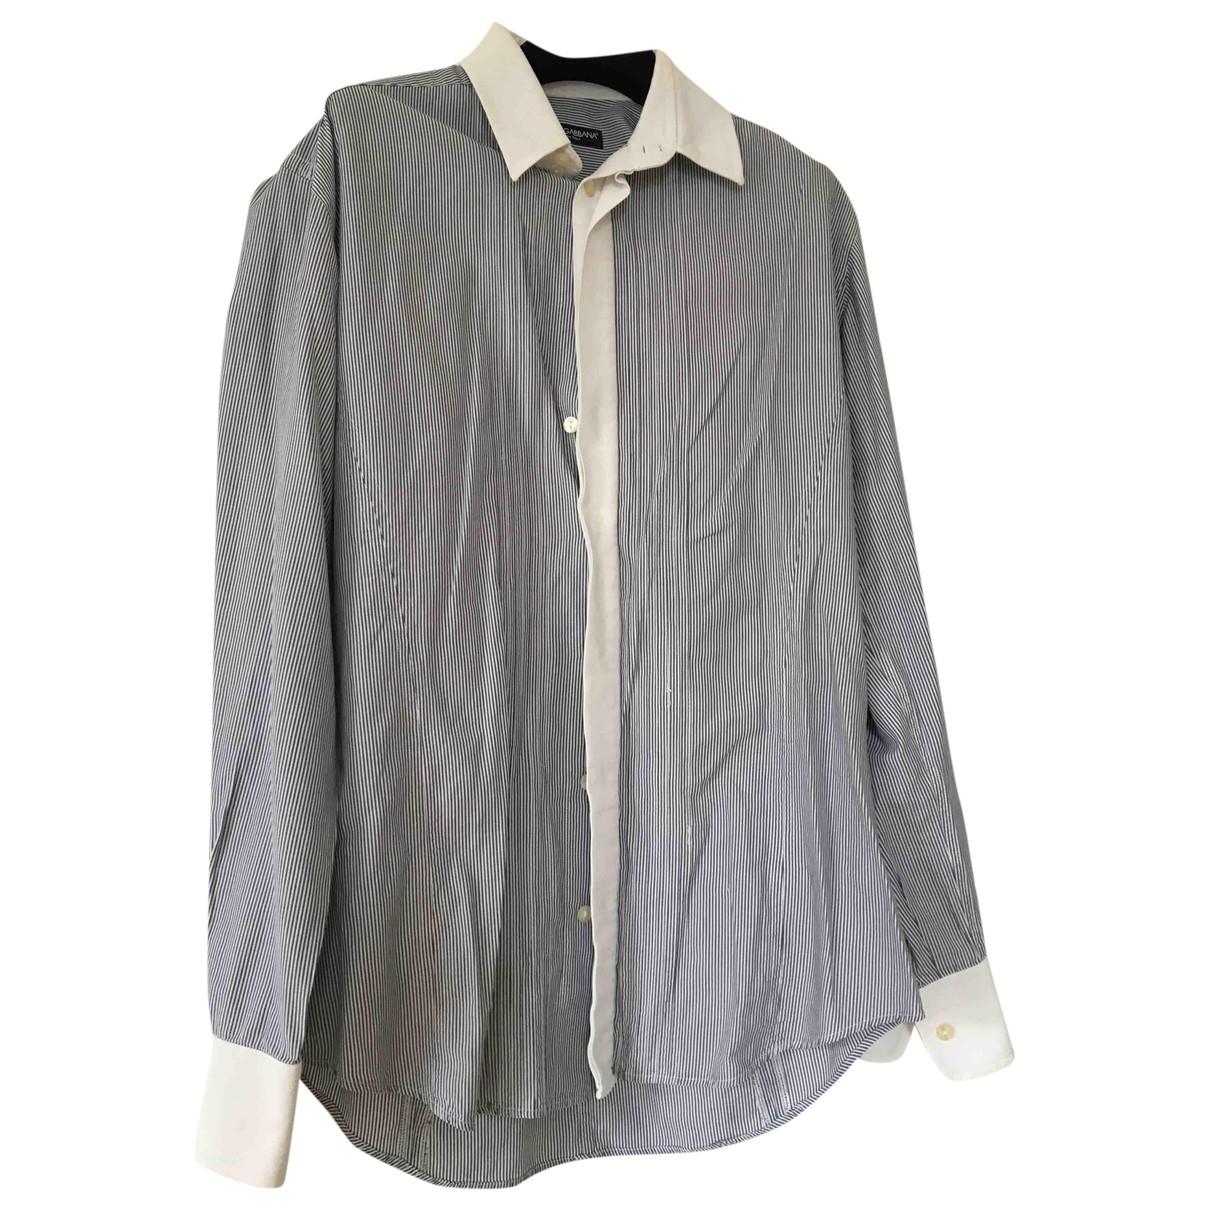 Dolce & Gabbana \N Blue Cotton Shirts for Men 39 EU (tour de cou / collar)